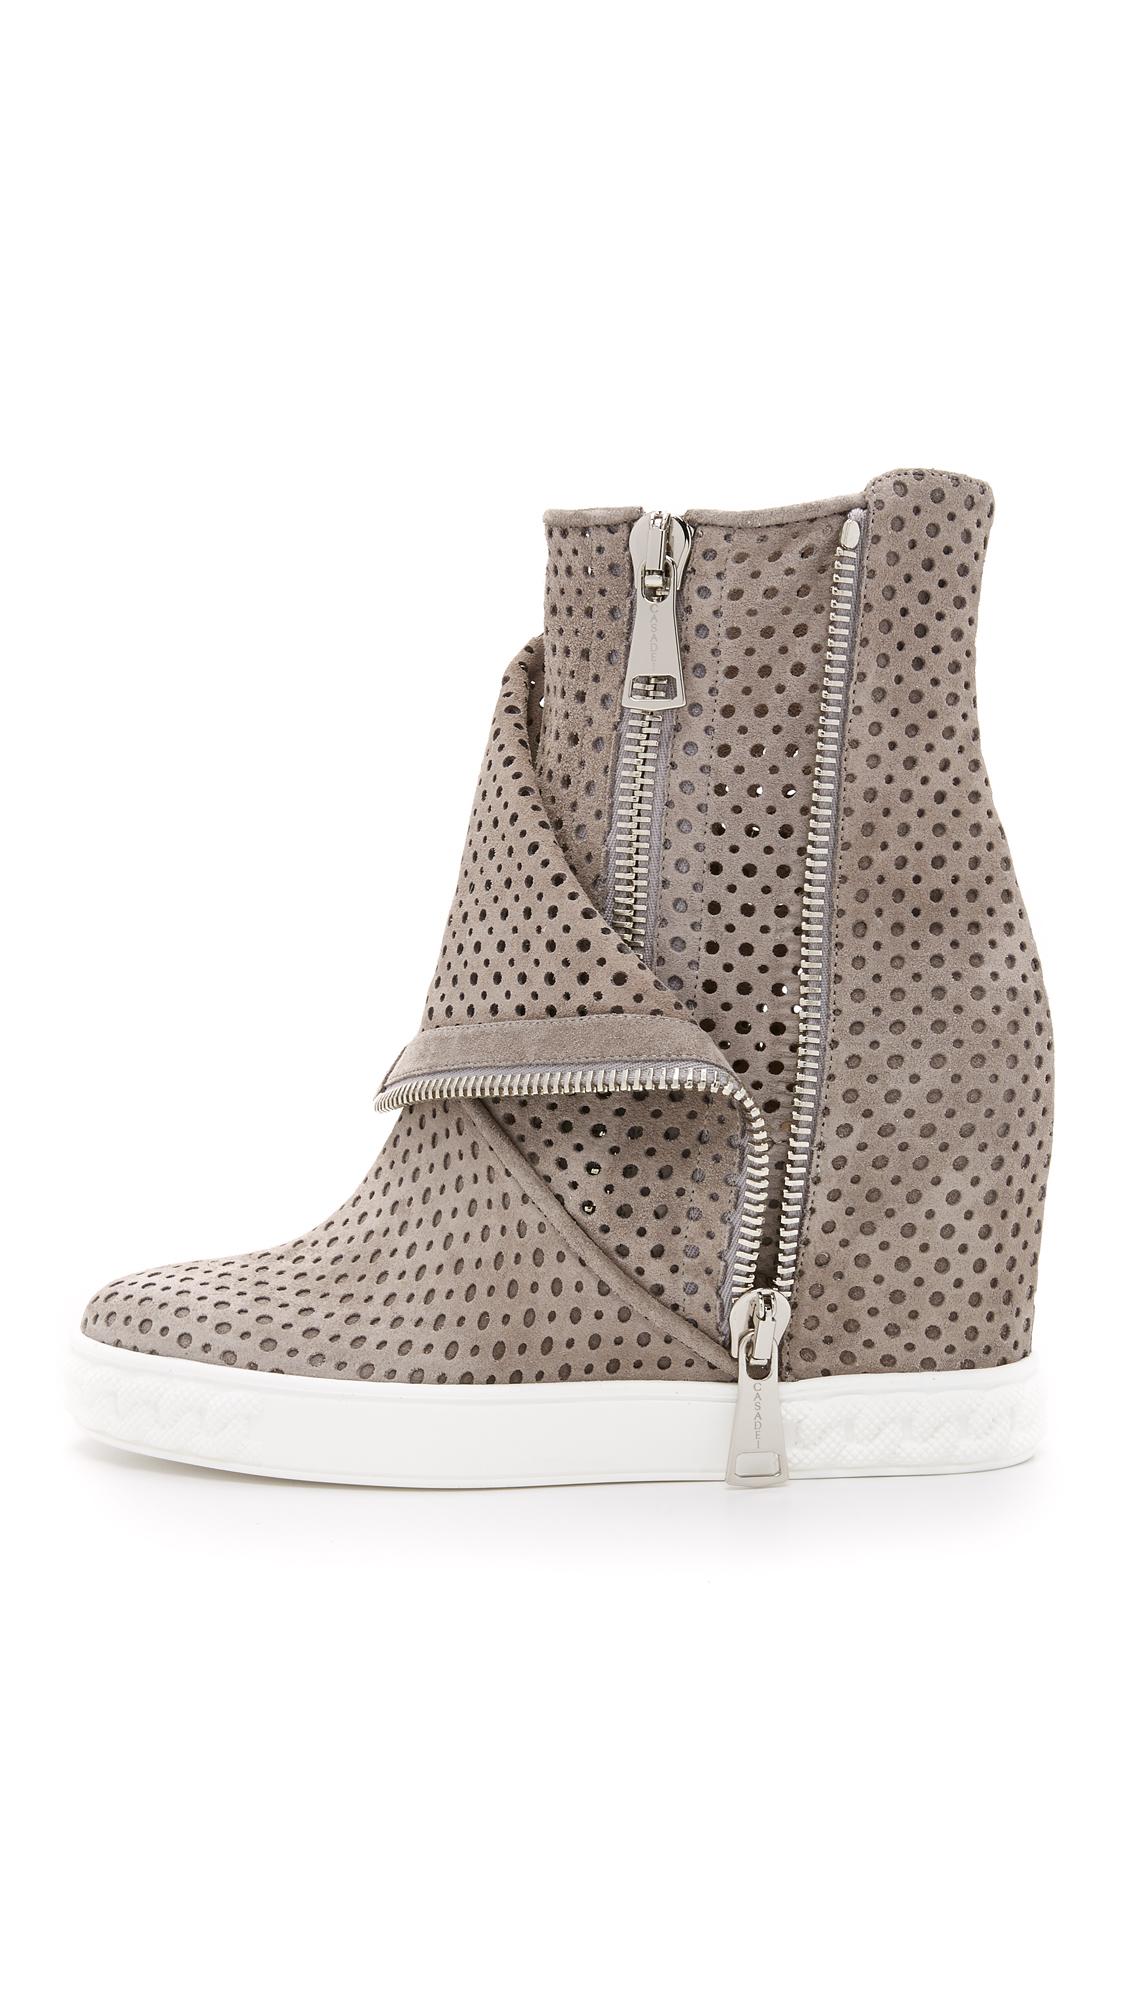 Sneaker calfskin perforated suede beige Casadei XXS3EKa